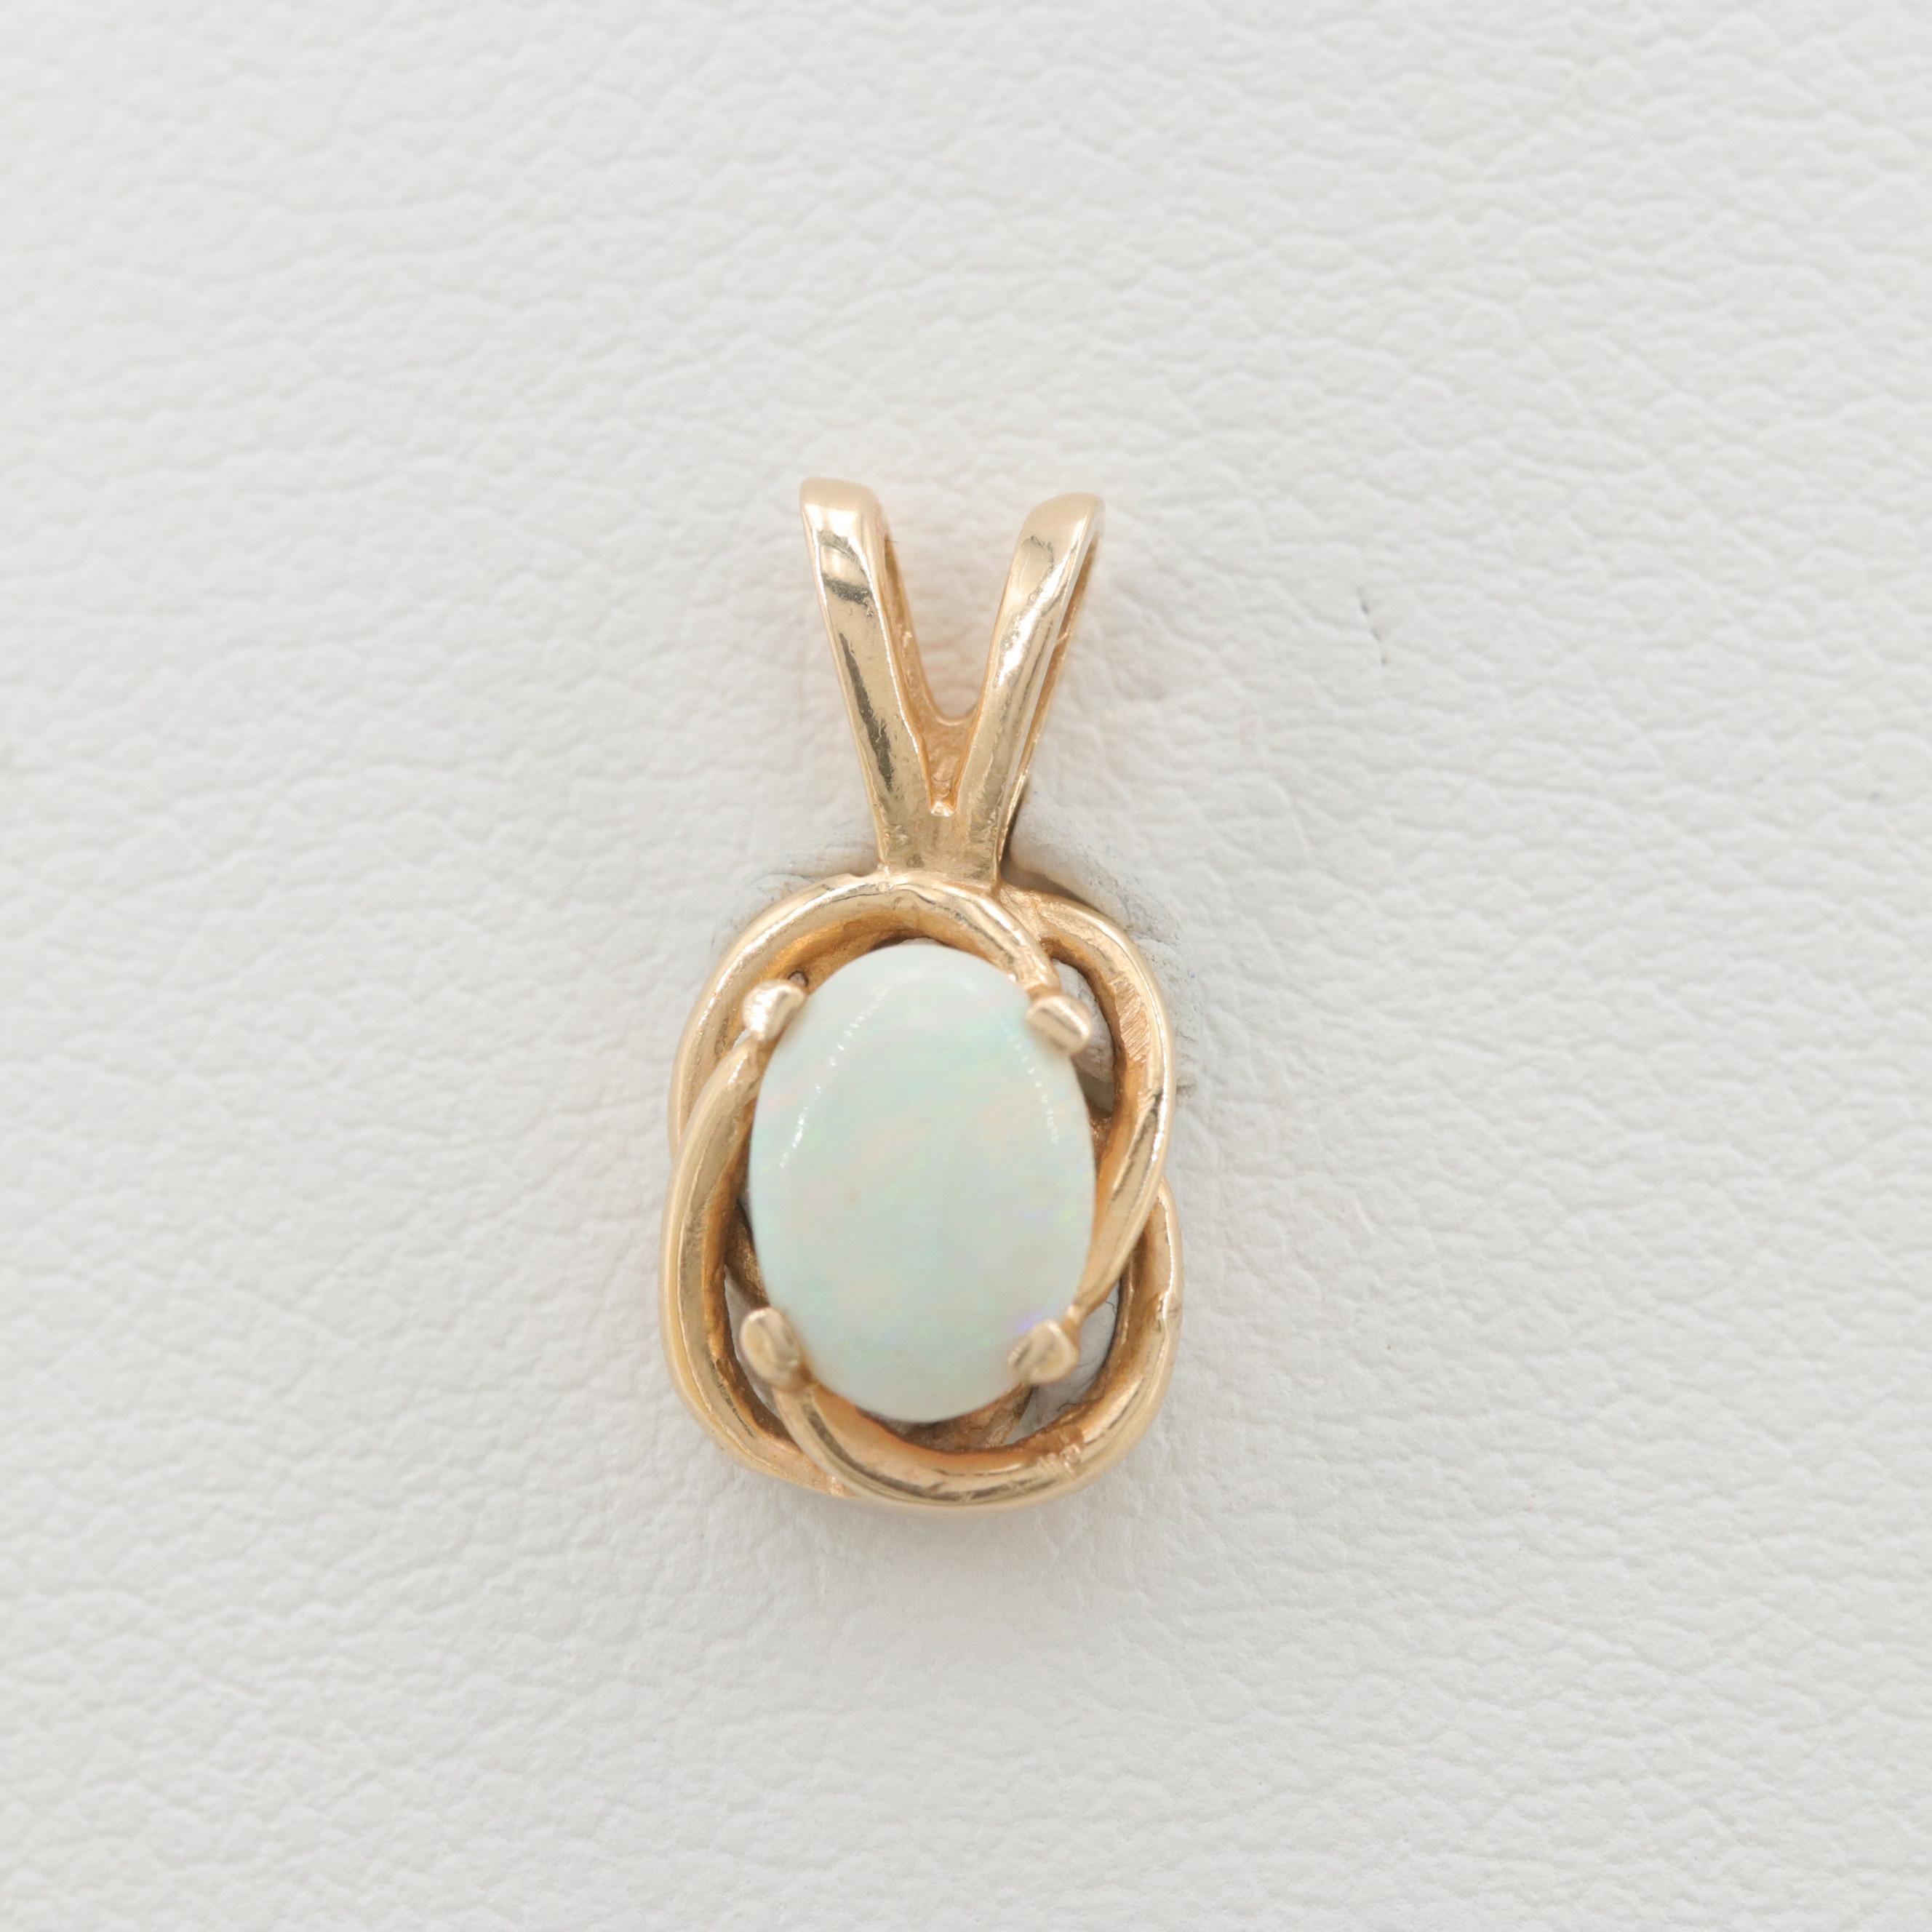 14K Yellow Gold Opal Pendant